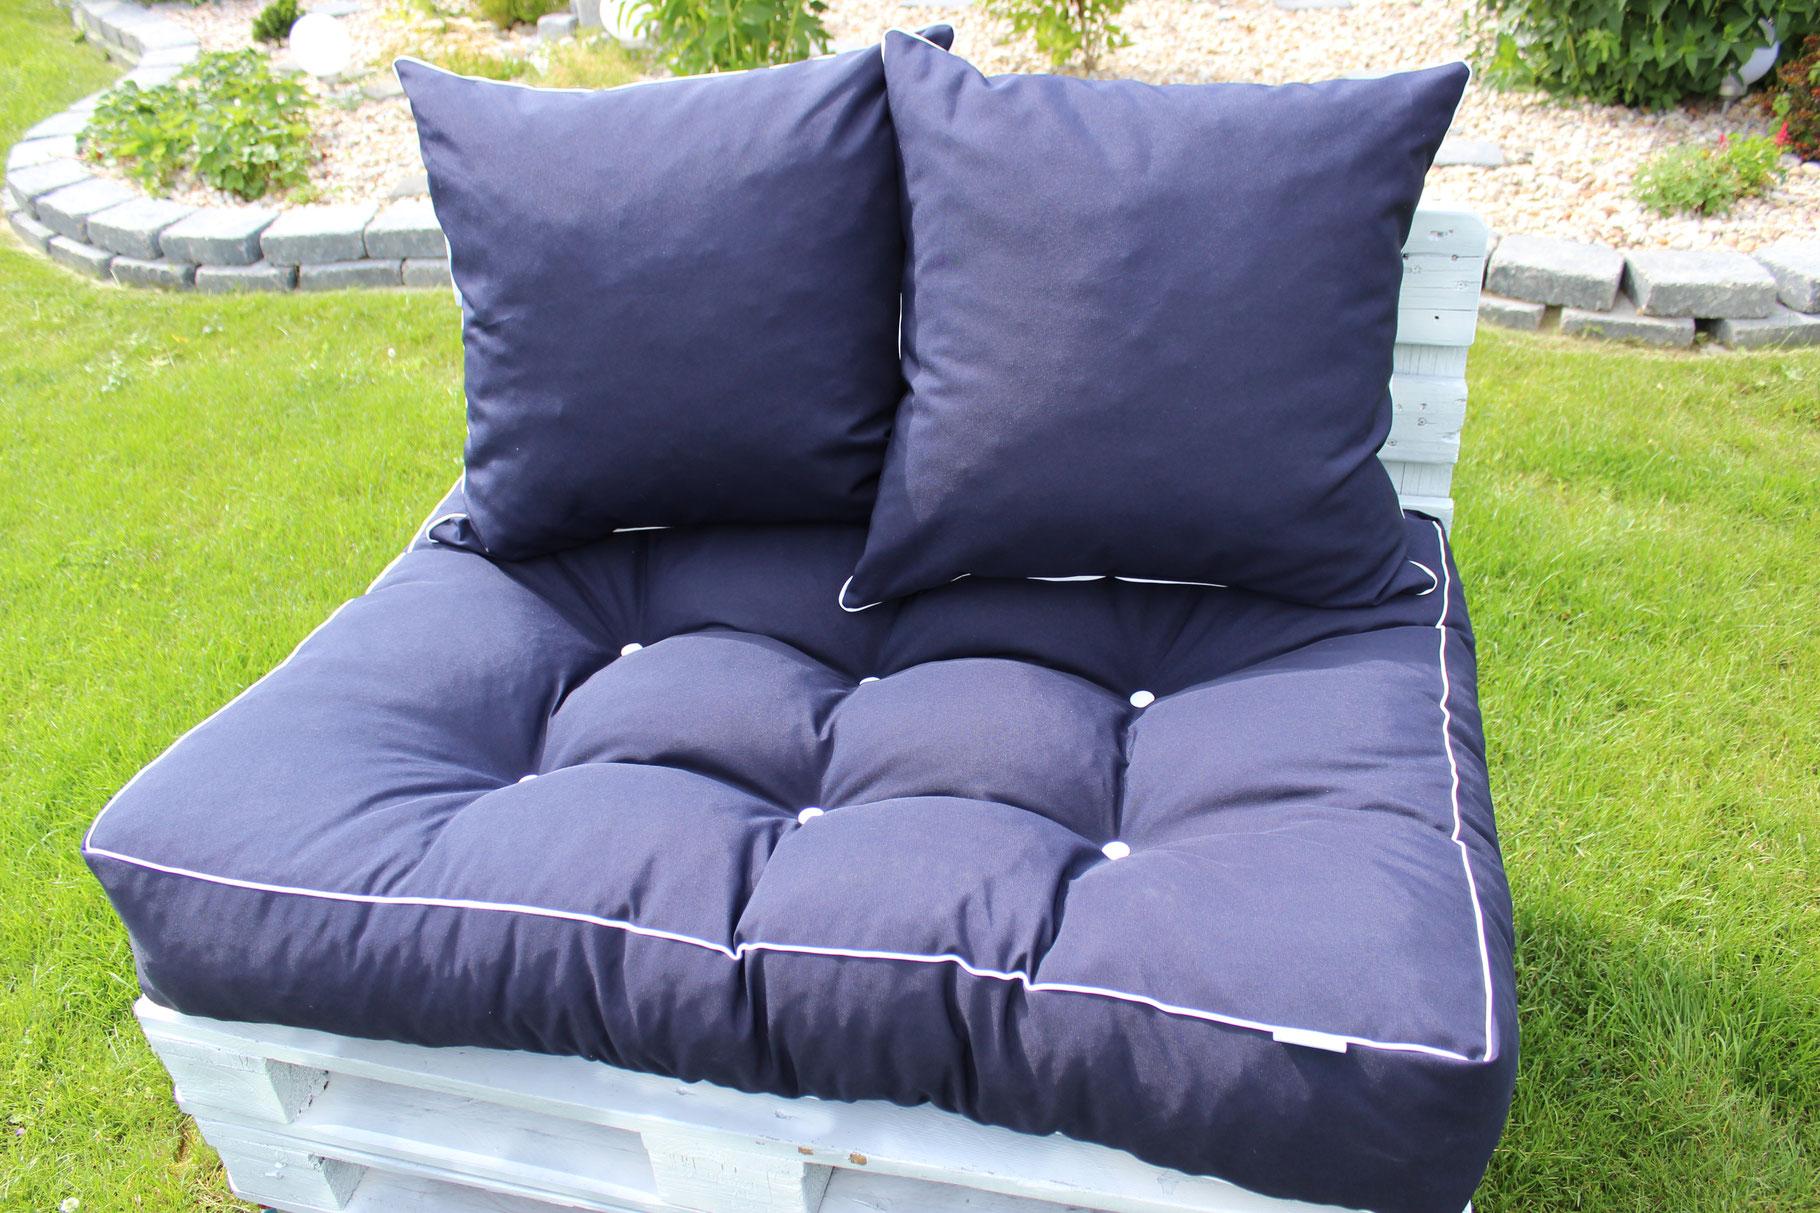 outdoor handmade cushions auflagen nach ma. Black Bedroom Furniture Sets. Home Design Ideas